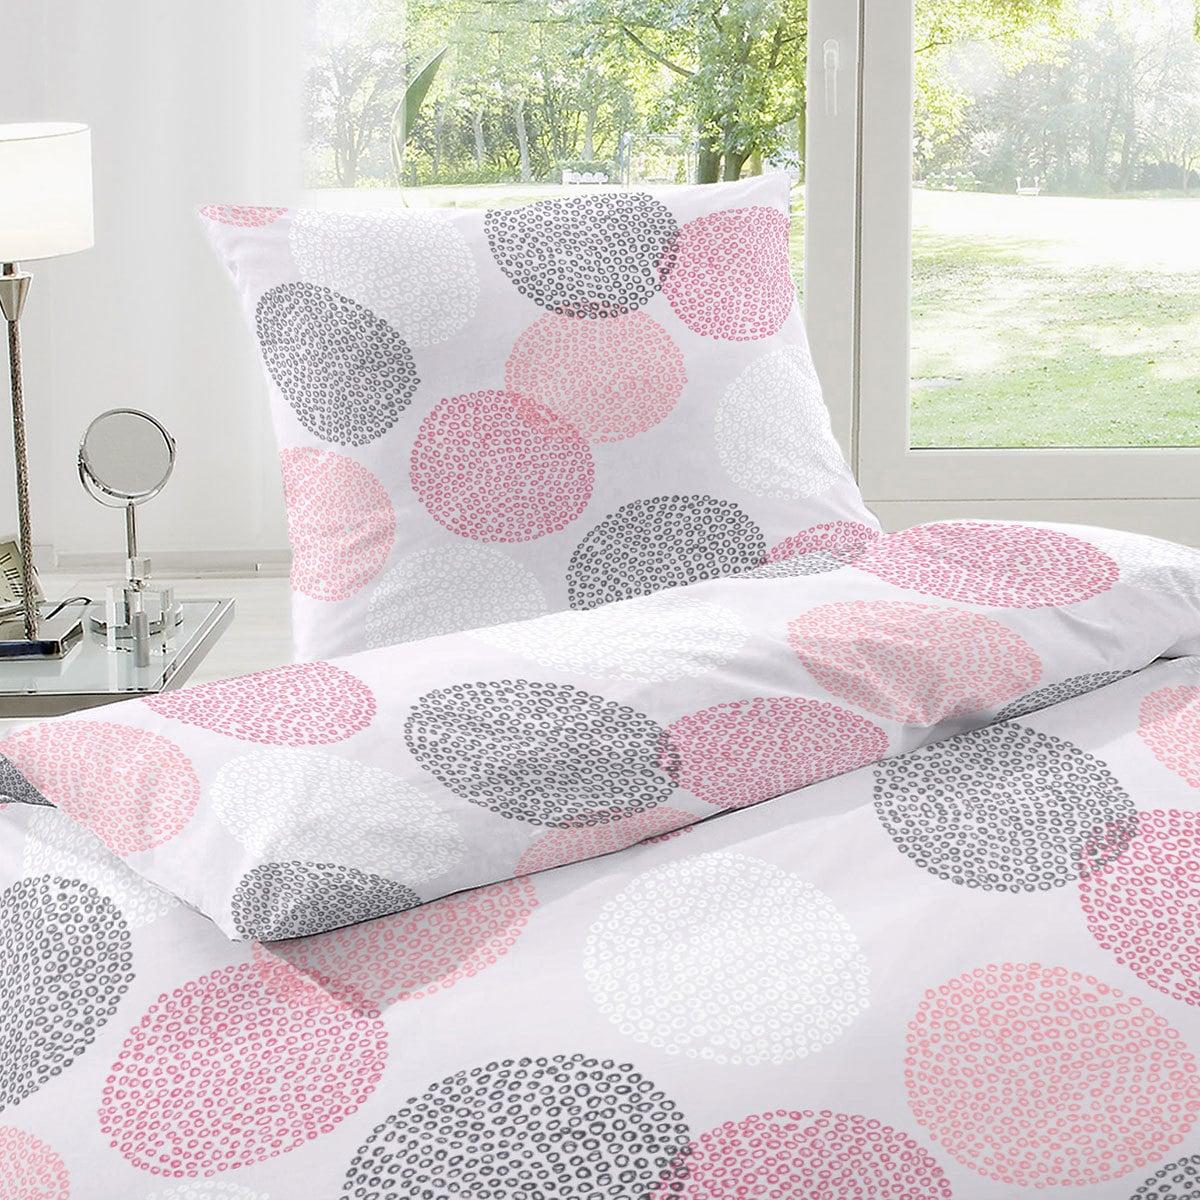 enrico coss baumwoll seersucker bettw sche punkte pink g nstig online kaufen bei bettwaren shop. Black Bedroom Furniture Sets. Home Design Ideas